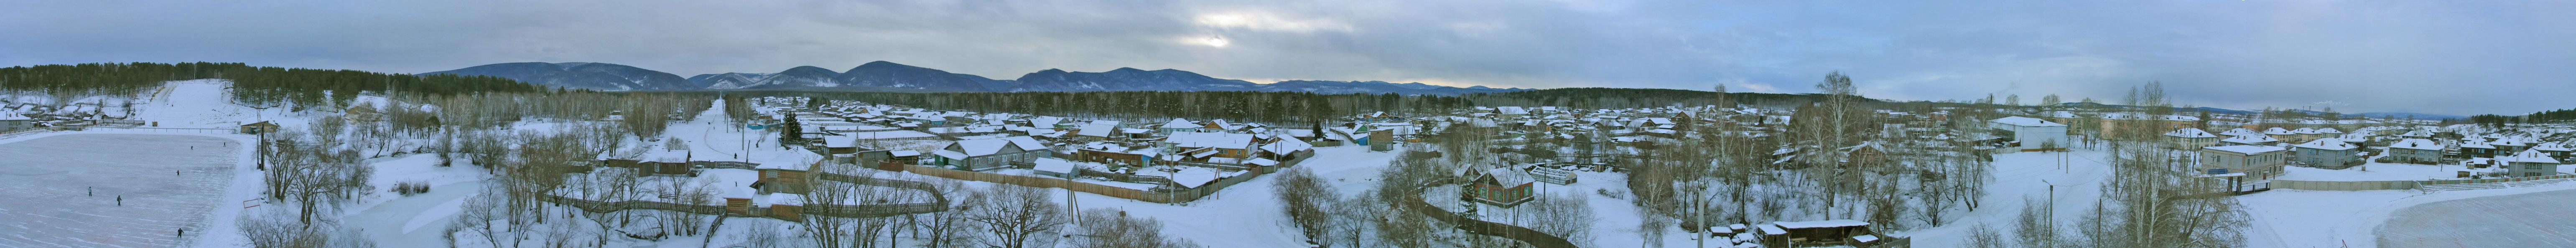 Селенгинск. Панорама поселка и окраин в районе стадиона Труд.jpg